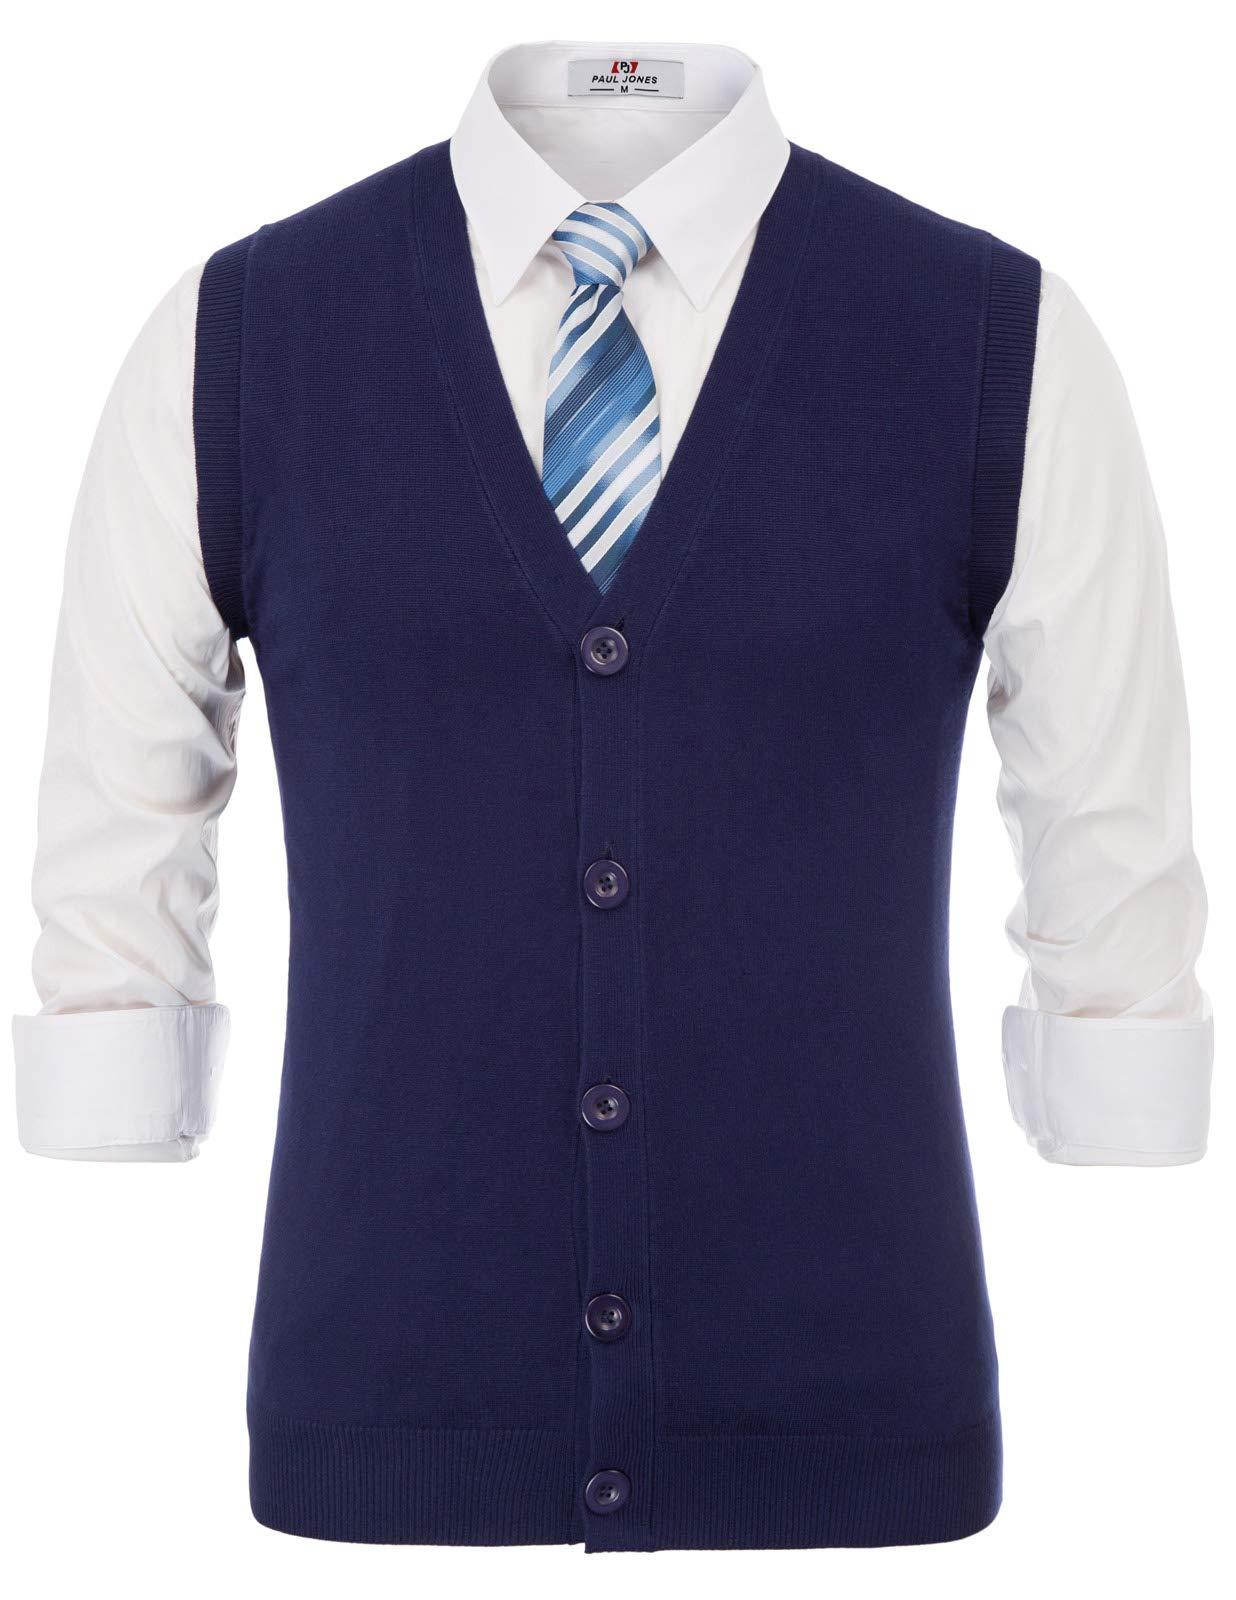 Stylish V-Neck Button Down Cardigan Sweater Vest for Men(Royal Blue-146,M)